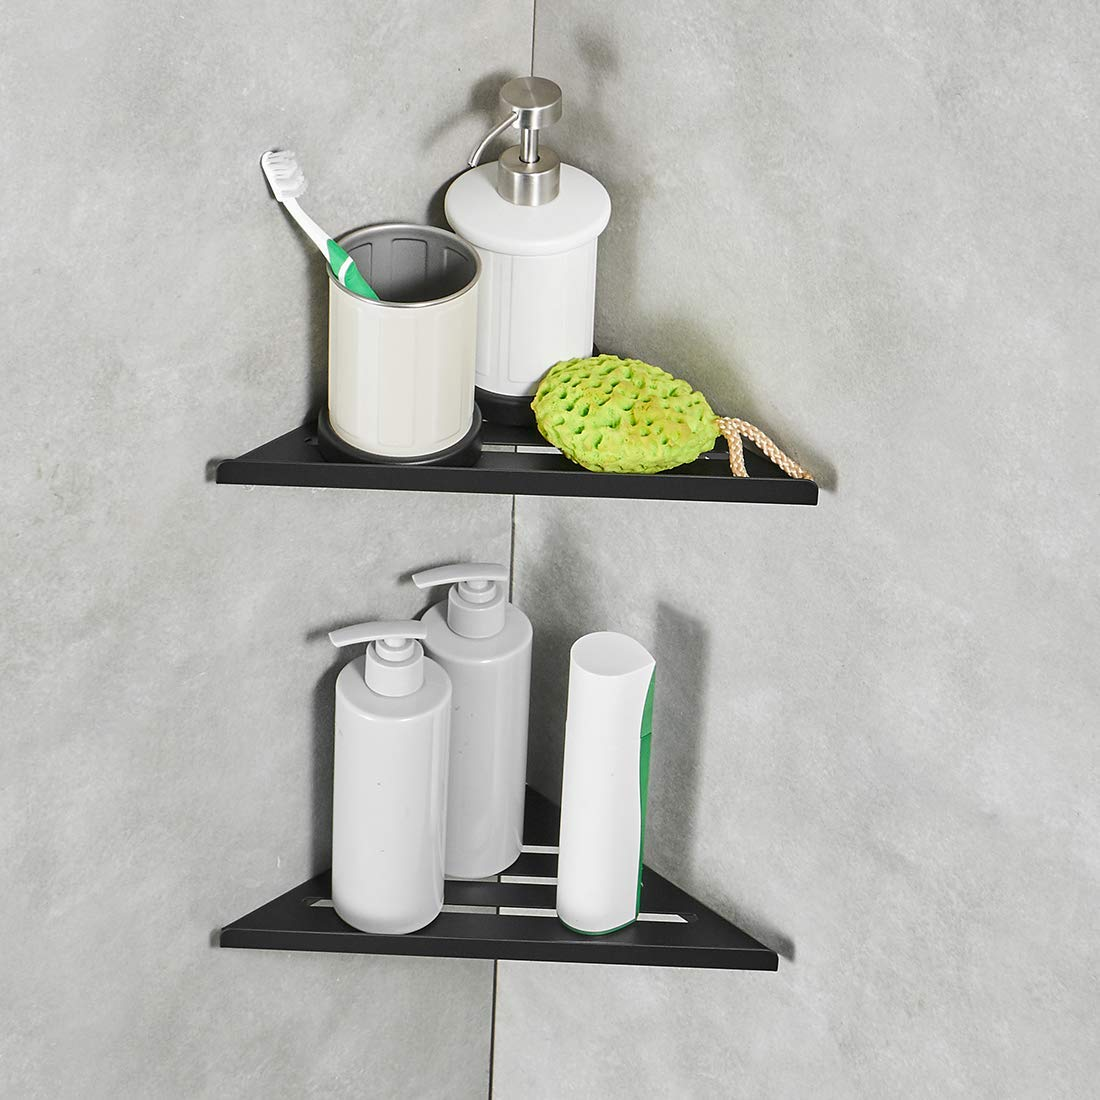 Us 19 8 40 Off Shower Corner Caddy Shower Shelf Bathroom Shelf Shower Corner Wall Mounted Stainless Steel Bath Shelf Black 3 Tiers In Bathroom